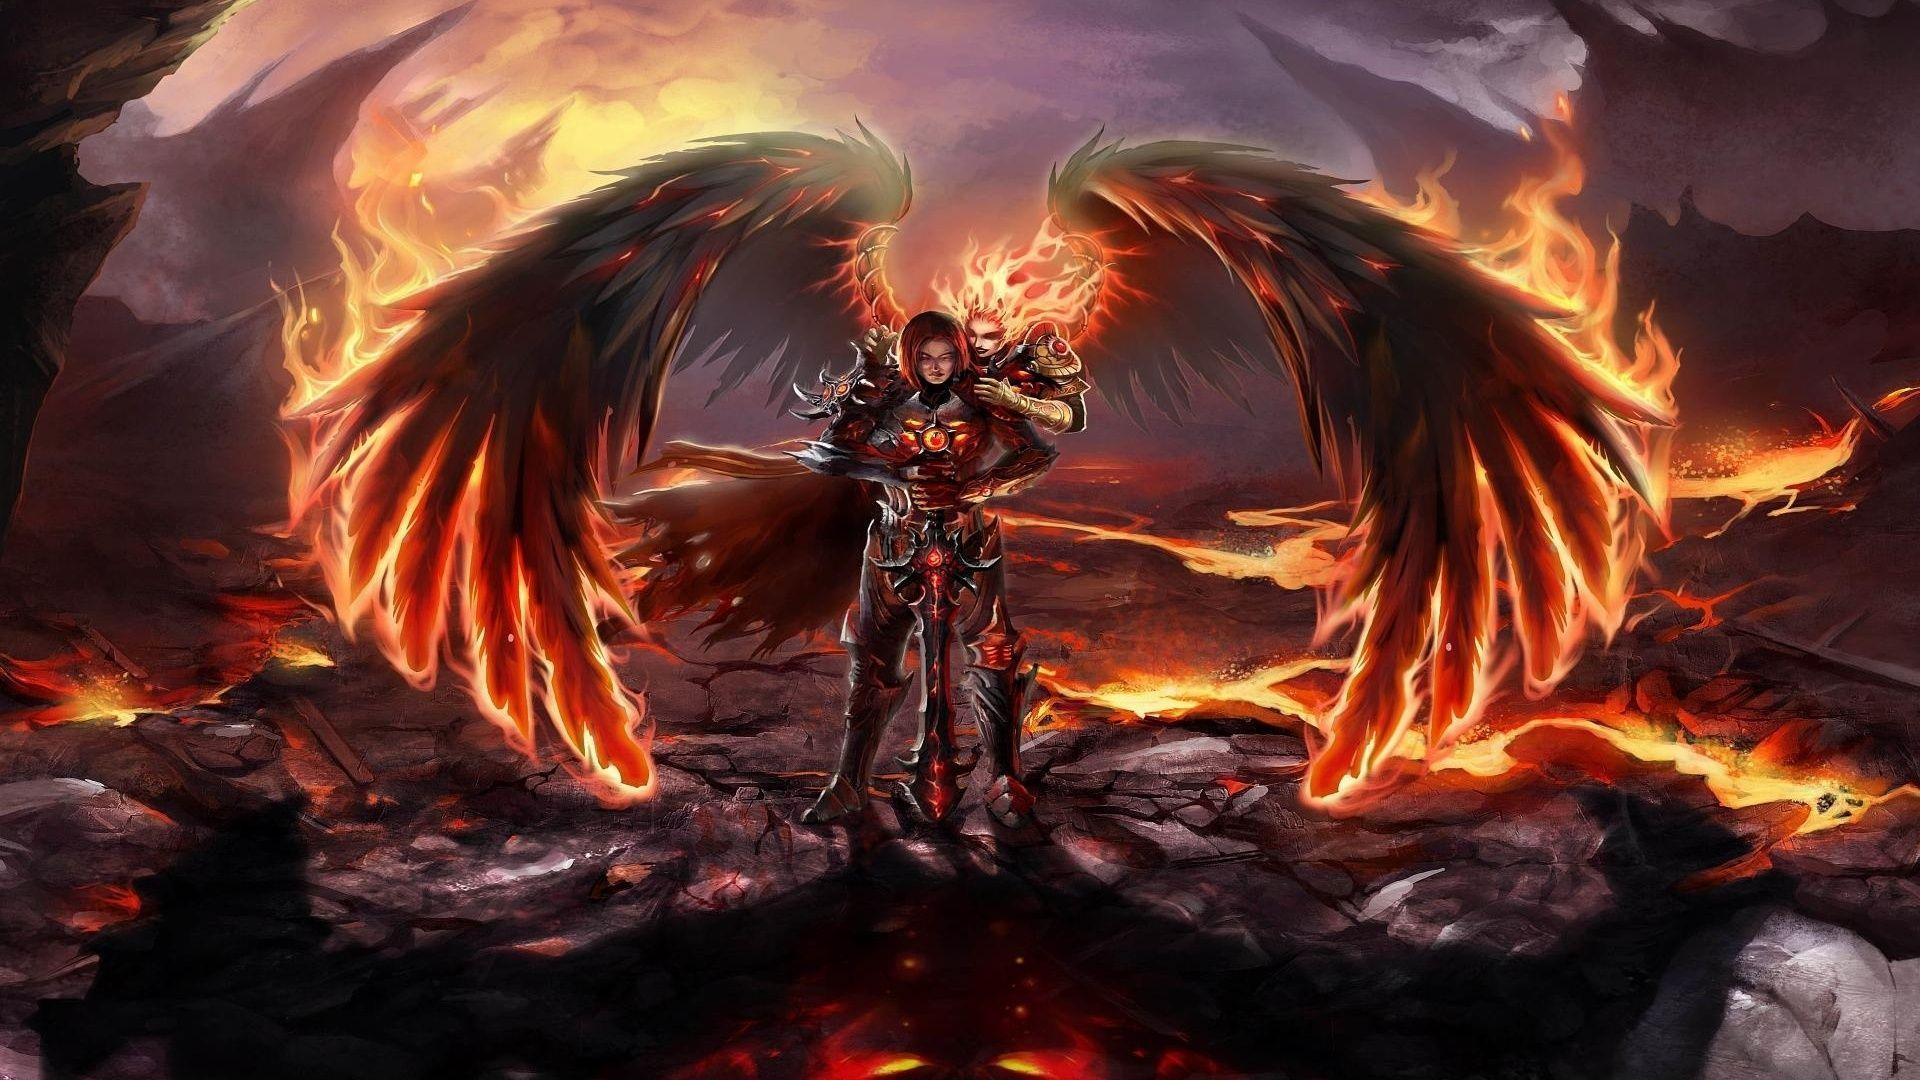 Angel Warrior HD Wallpapers Backgrounds Wallpaper